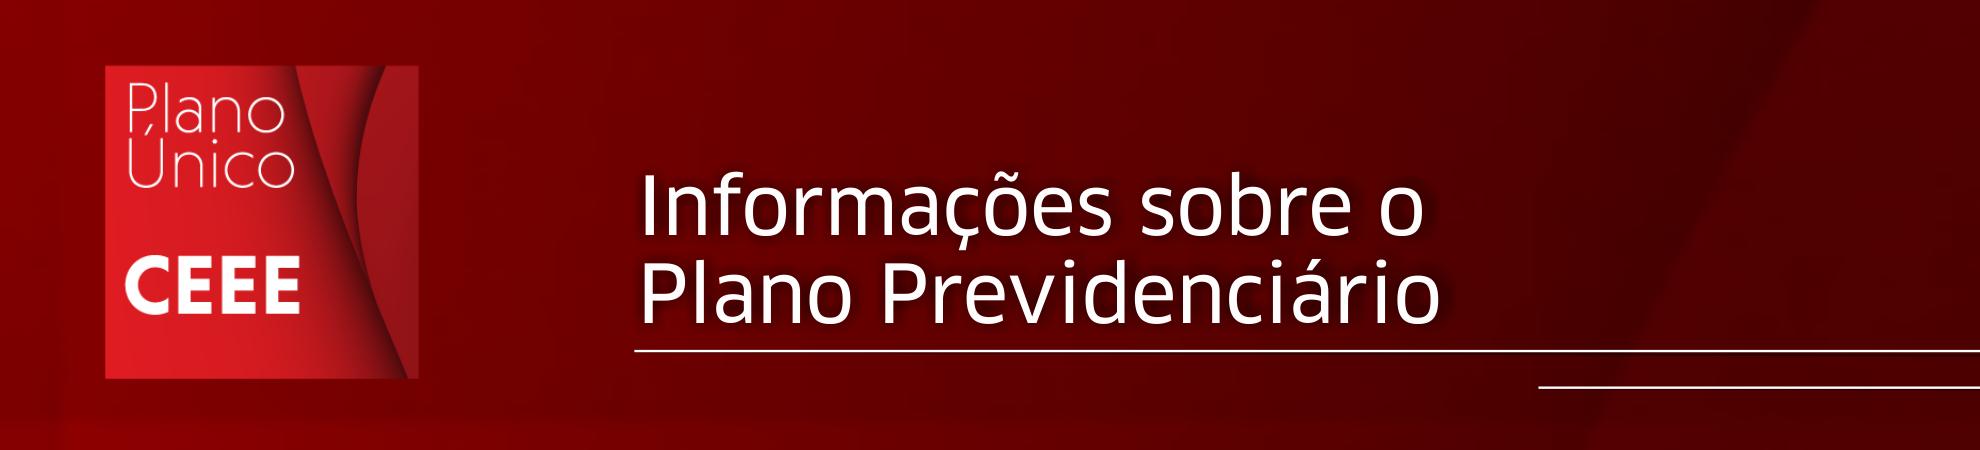 cabecalho_informacoes_puceee